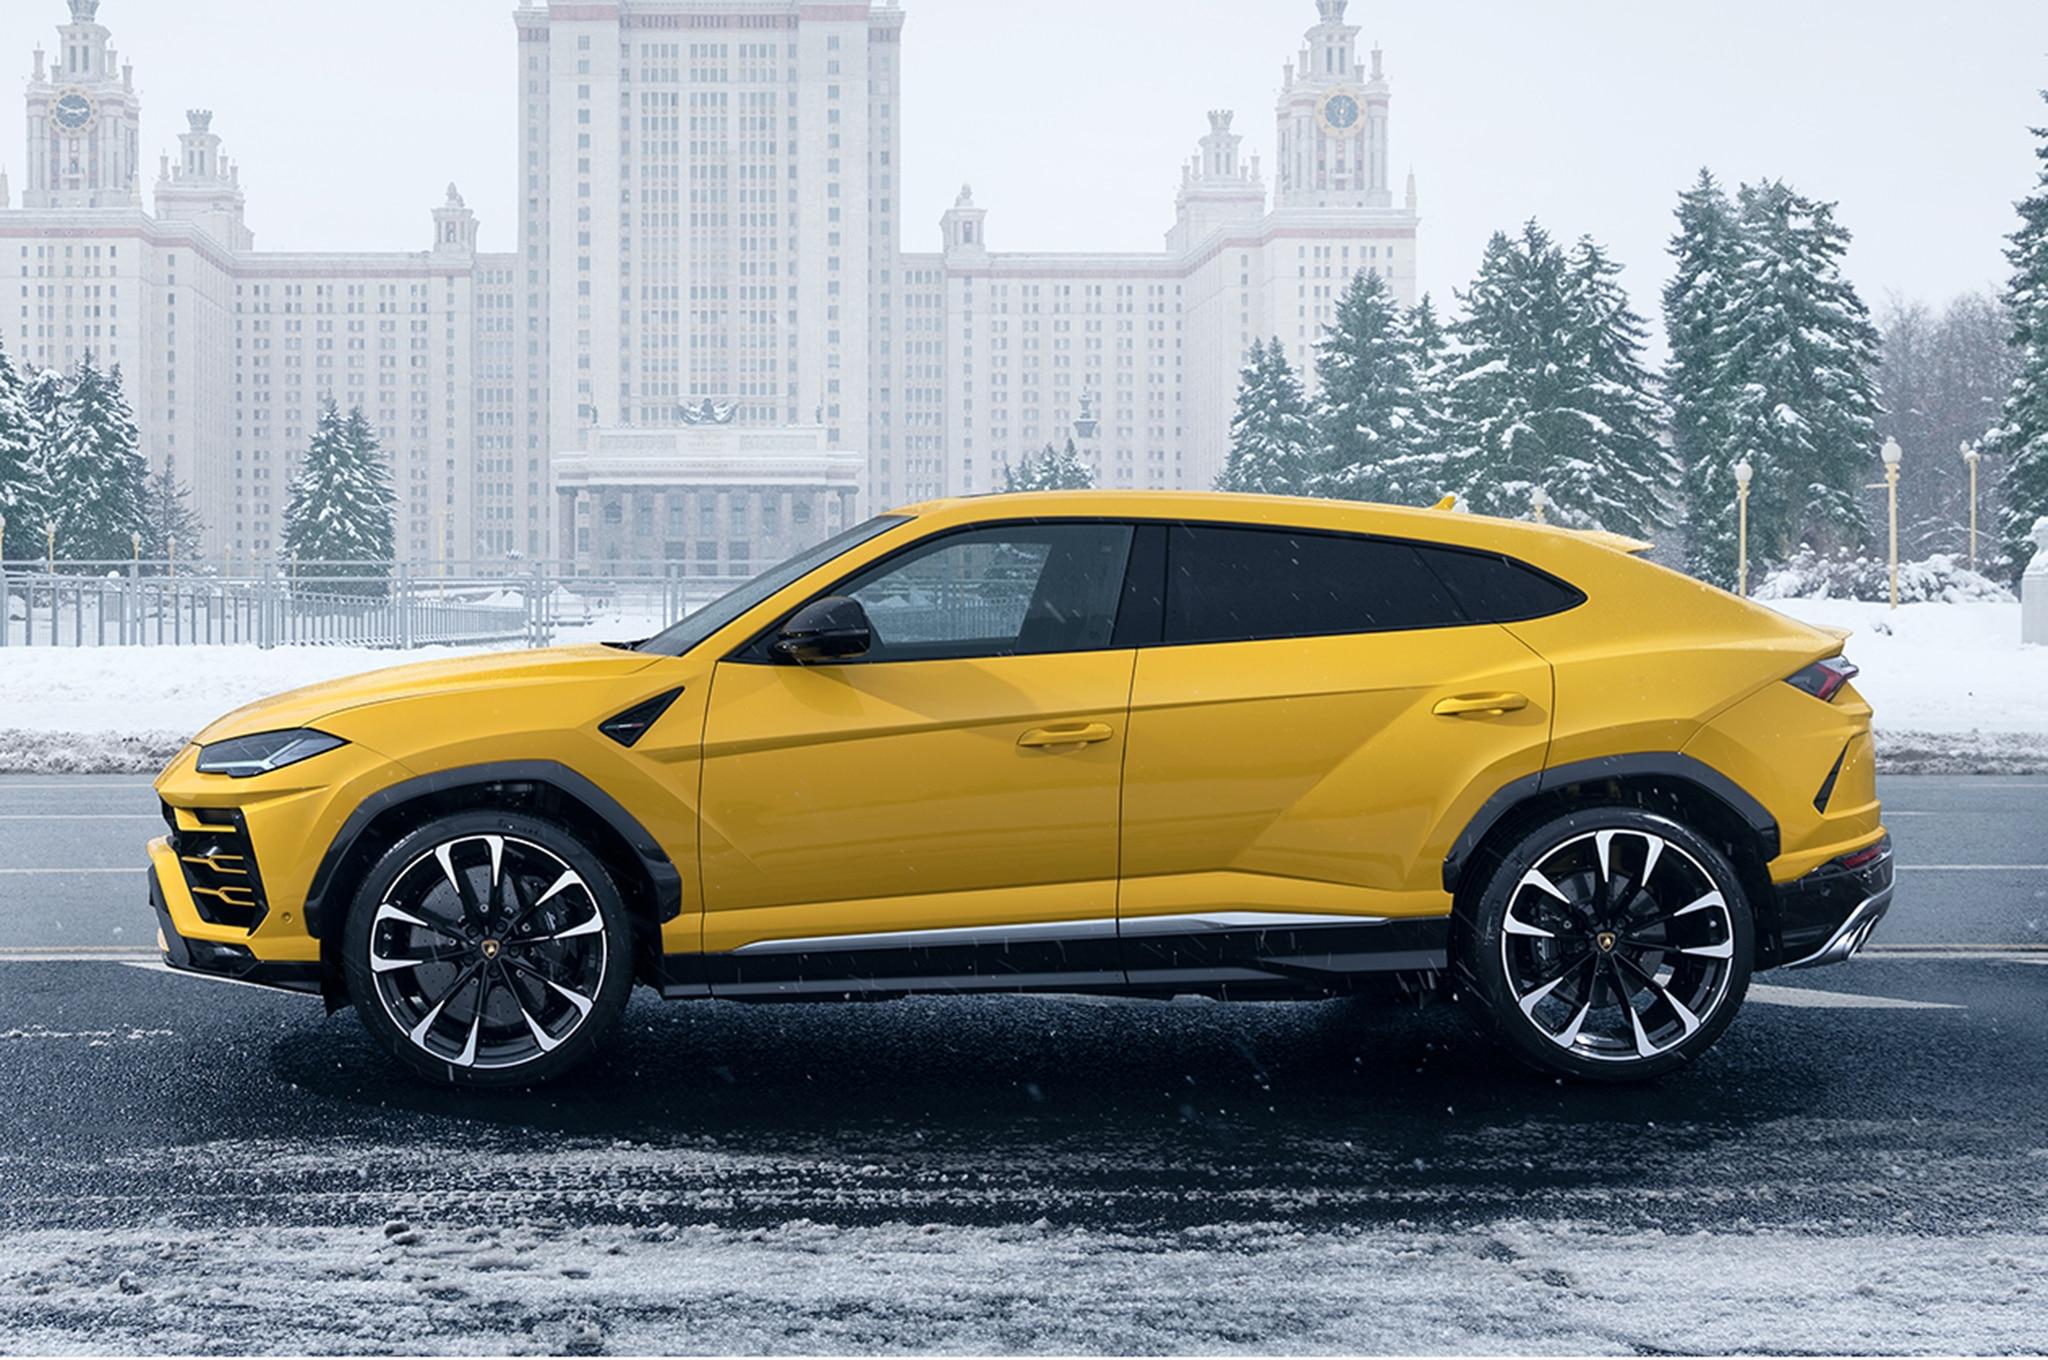 2019 New and Future Cars: Lamborghini Urus | Automobile ...